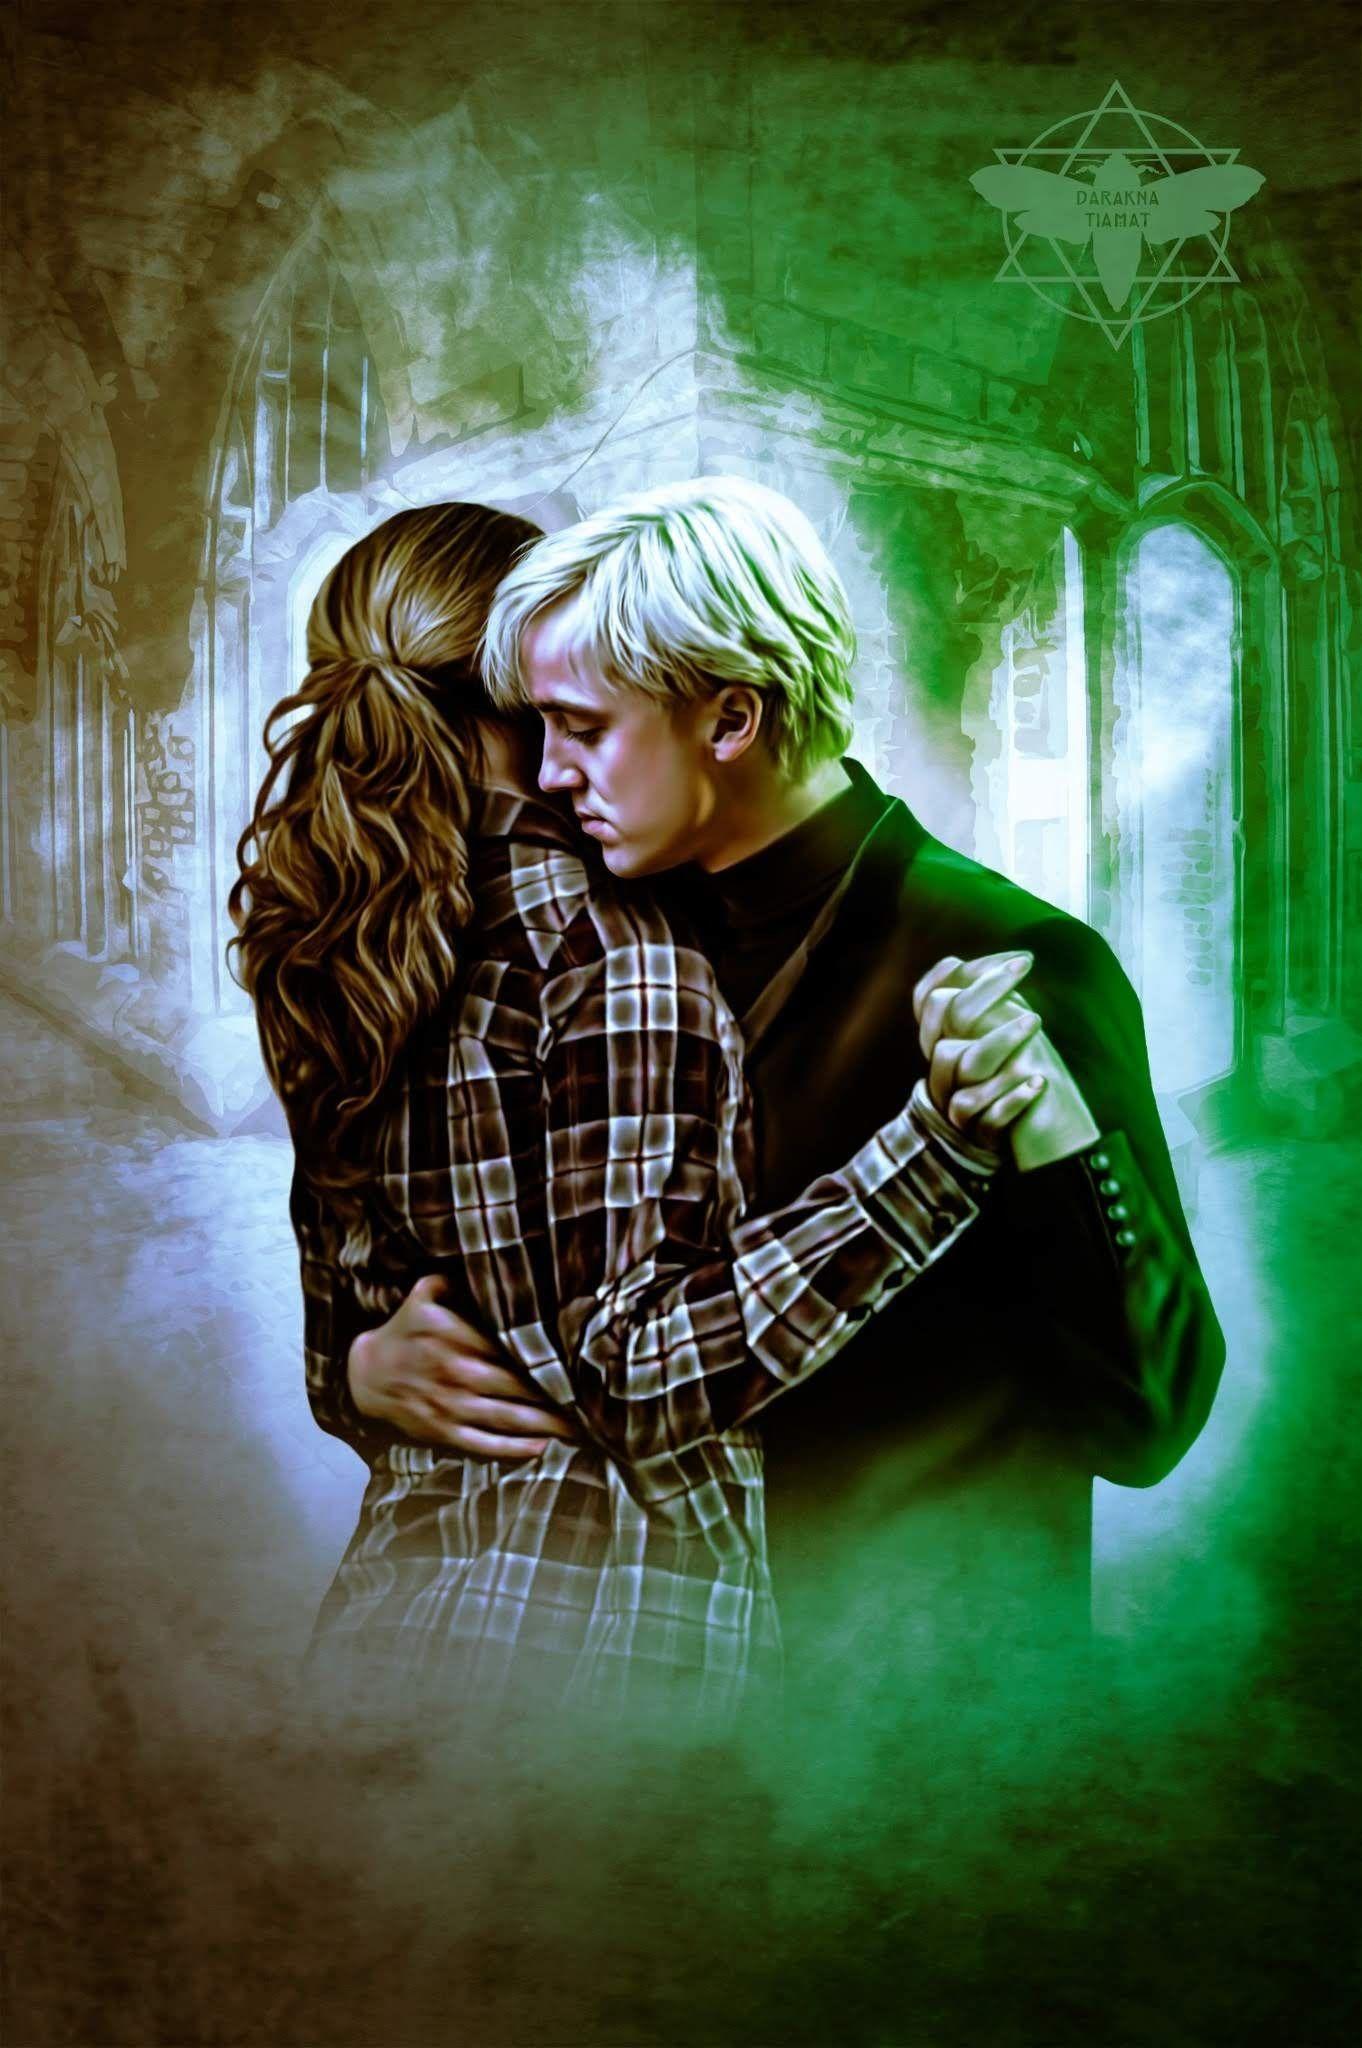 Dramonie Love Harry Potter Fanfiction Check Out Our Harry Potter Fanfiction Recommended Reading Li Harry Potter Hermione Dramione Harry Potter Draco Malfoy